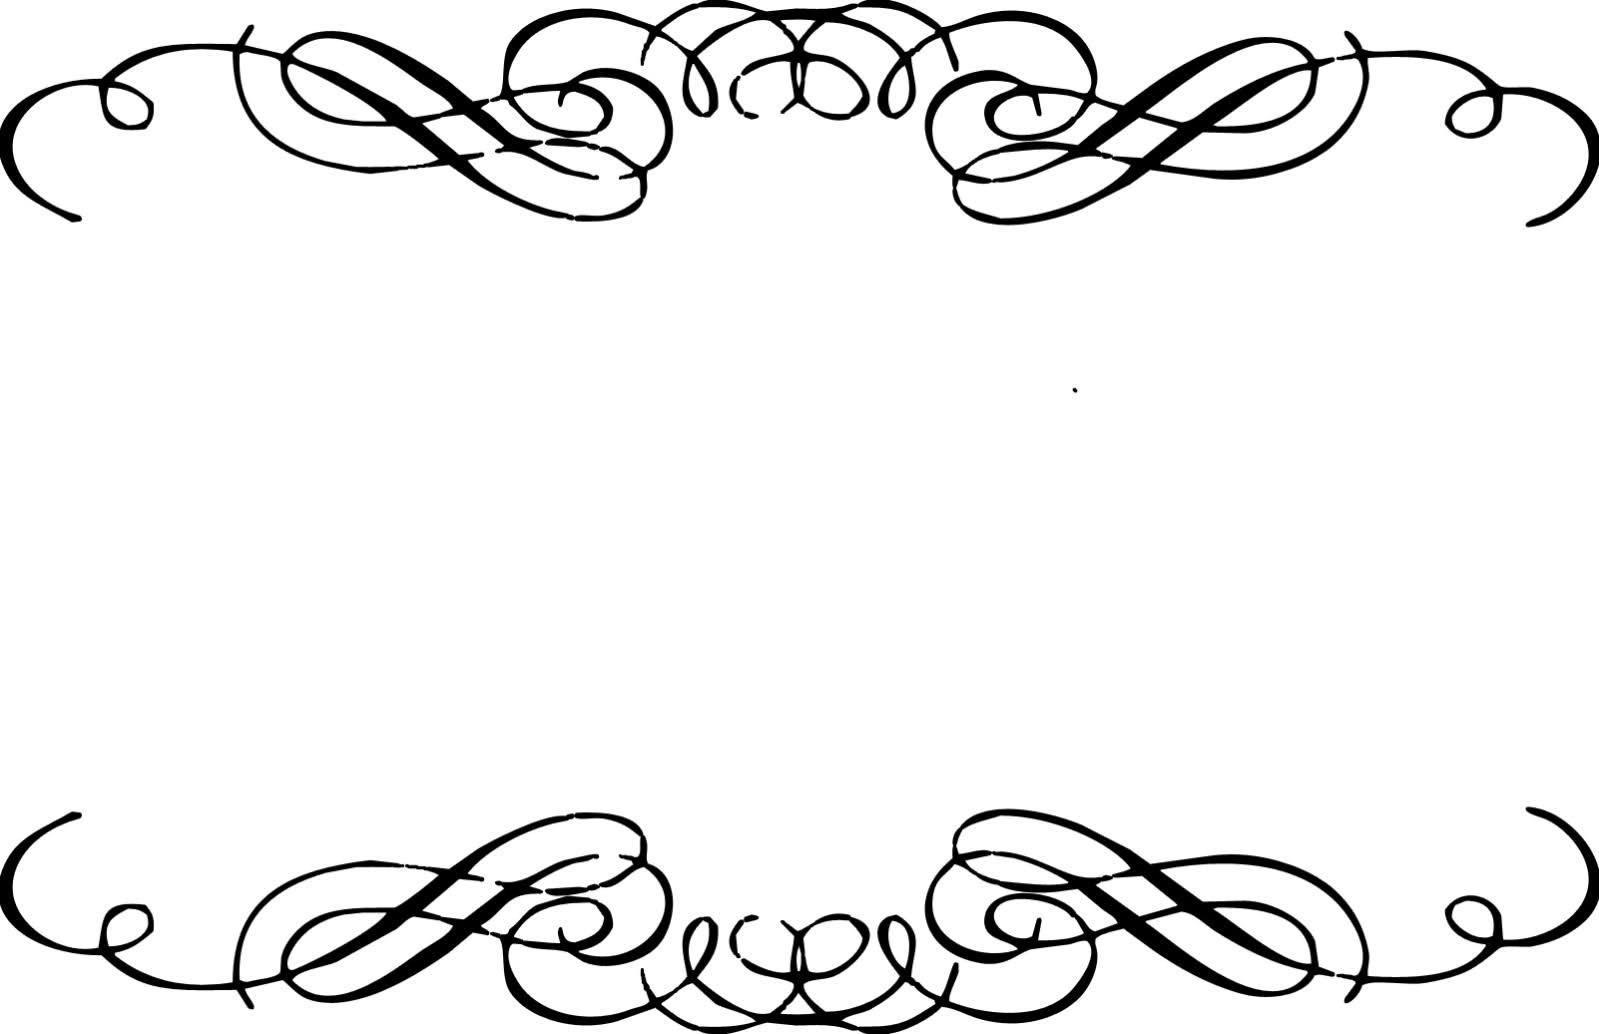 Free Wedding Scrolls Borders Clip Art